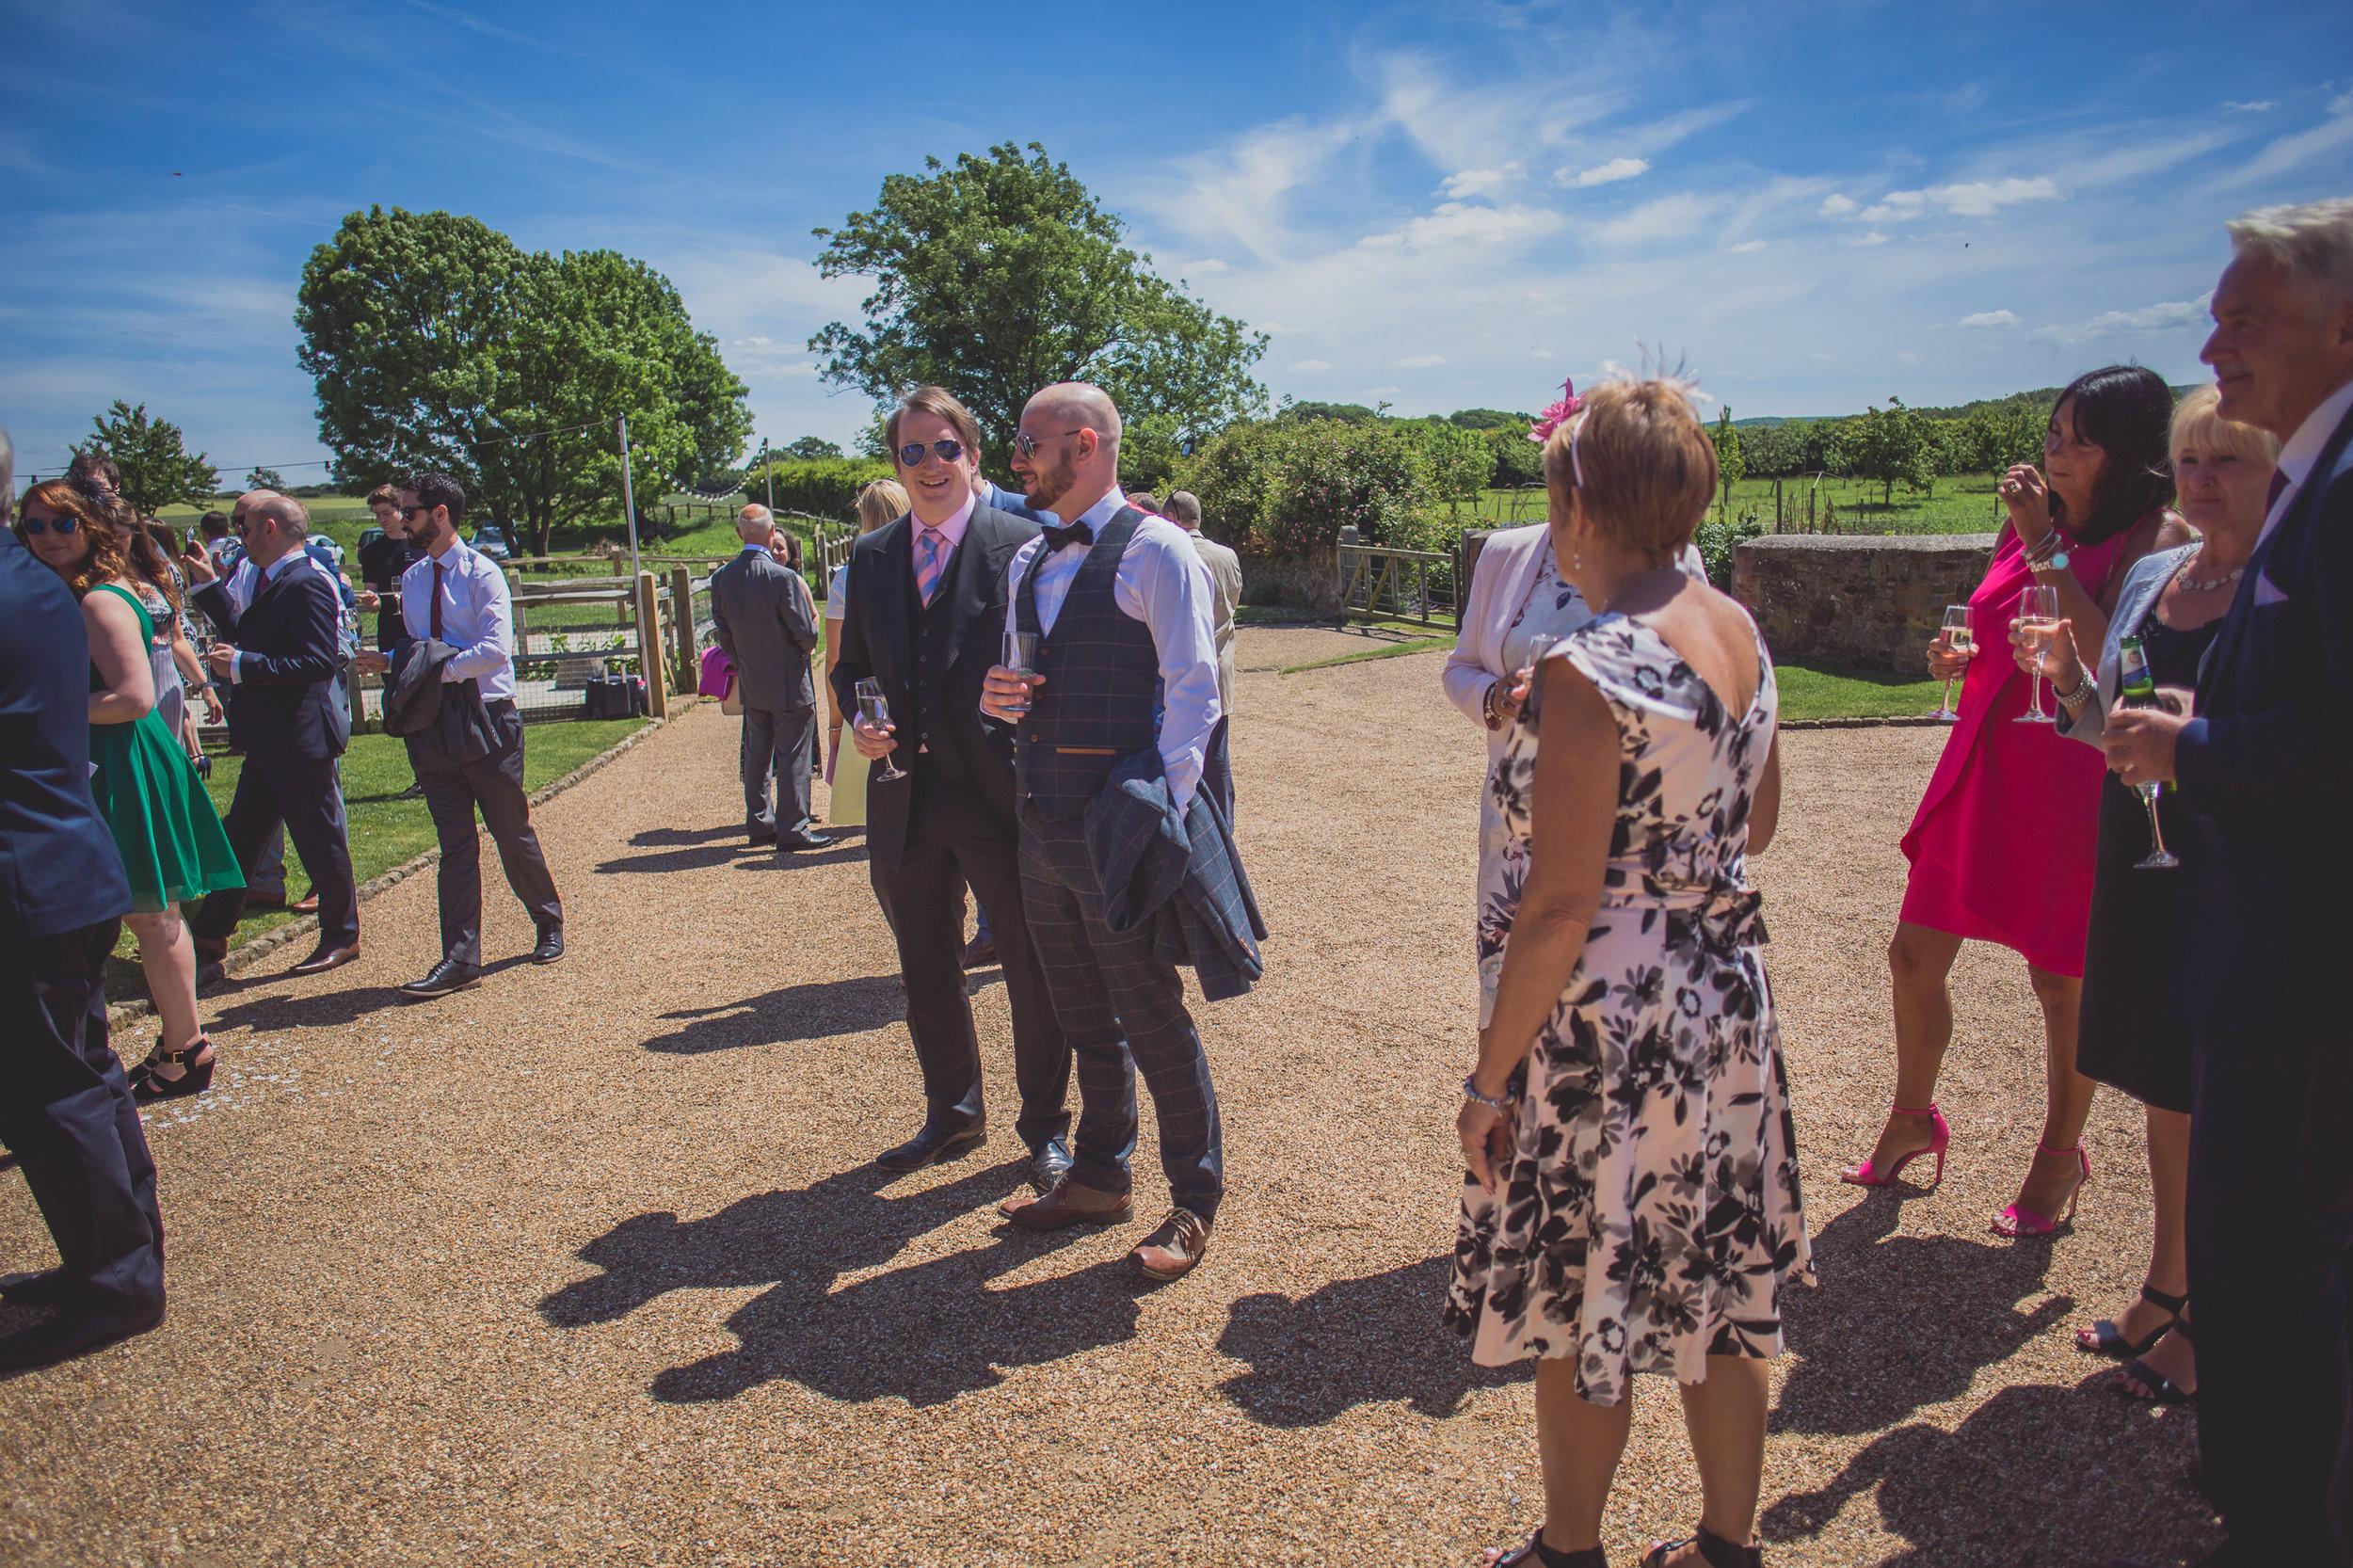 Grittenham Barn female wedding photographers west sussex petworth social-82.jpg